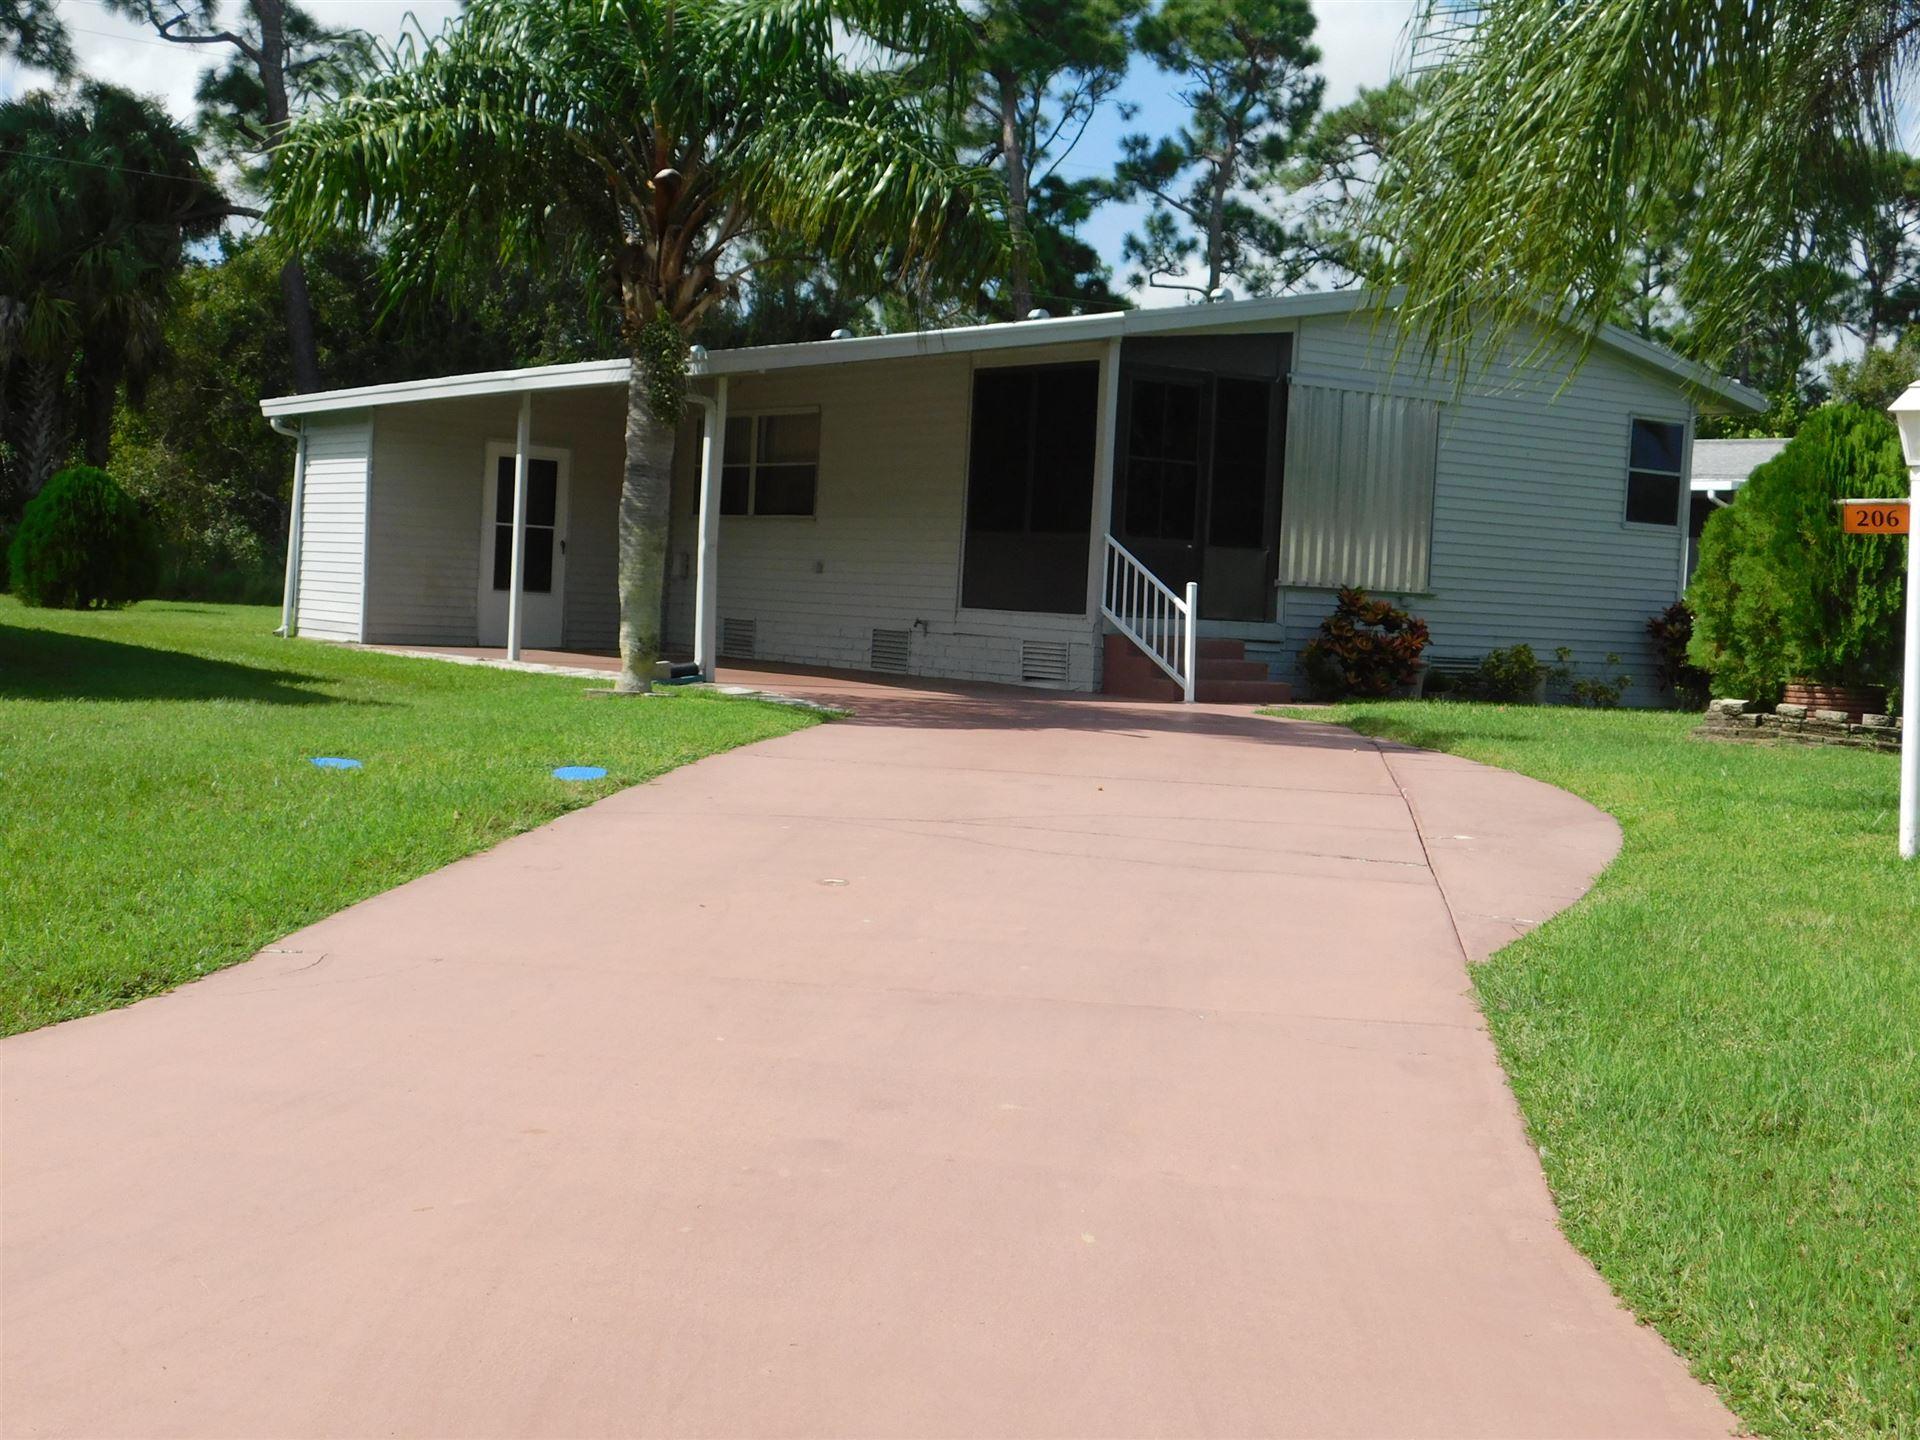 206 Travis Cay Place, Fort Pierce, FL 34982 - #: RX-10667133